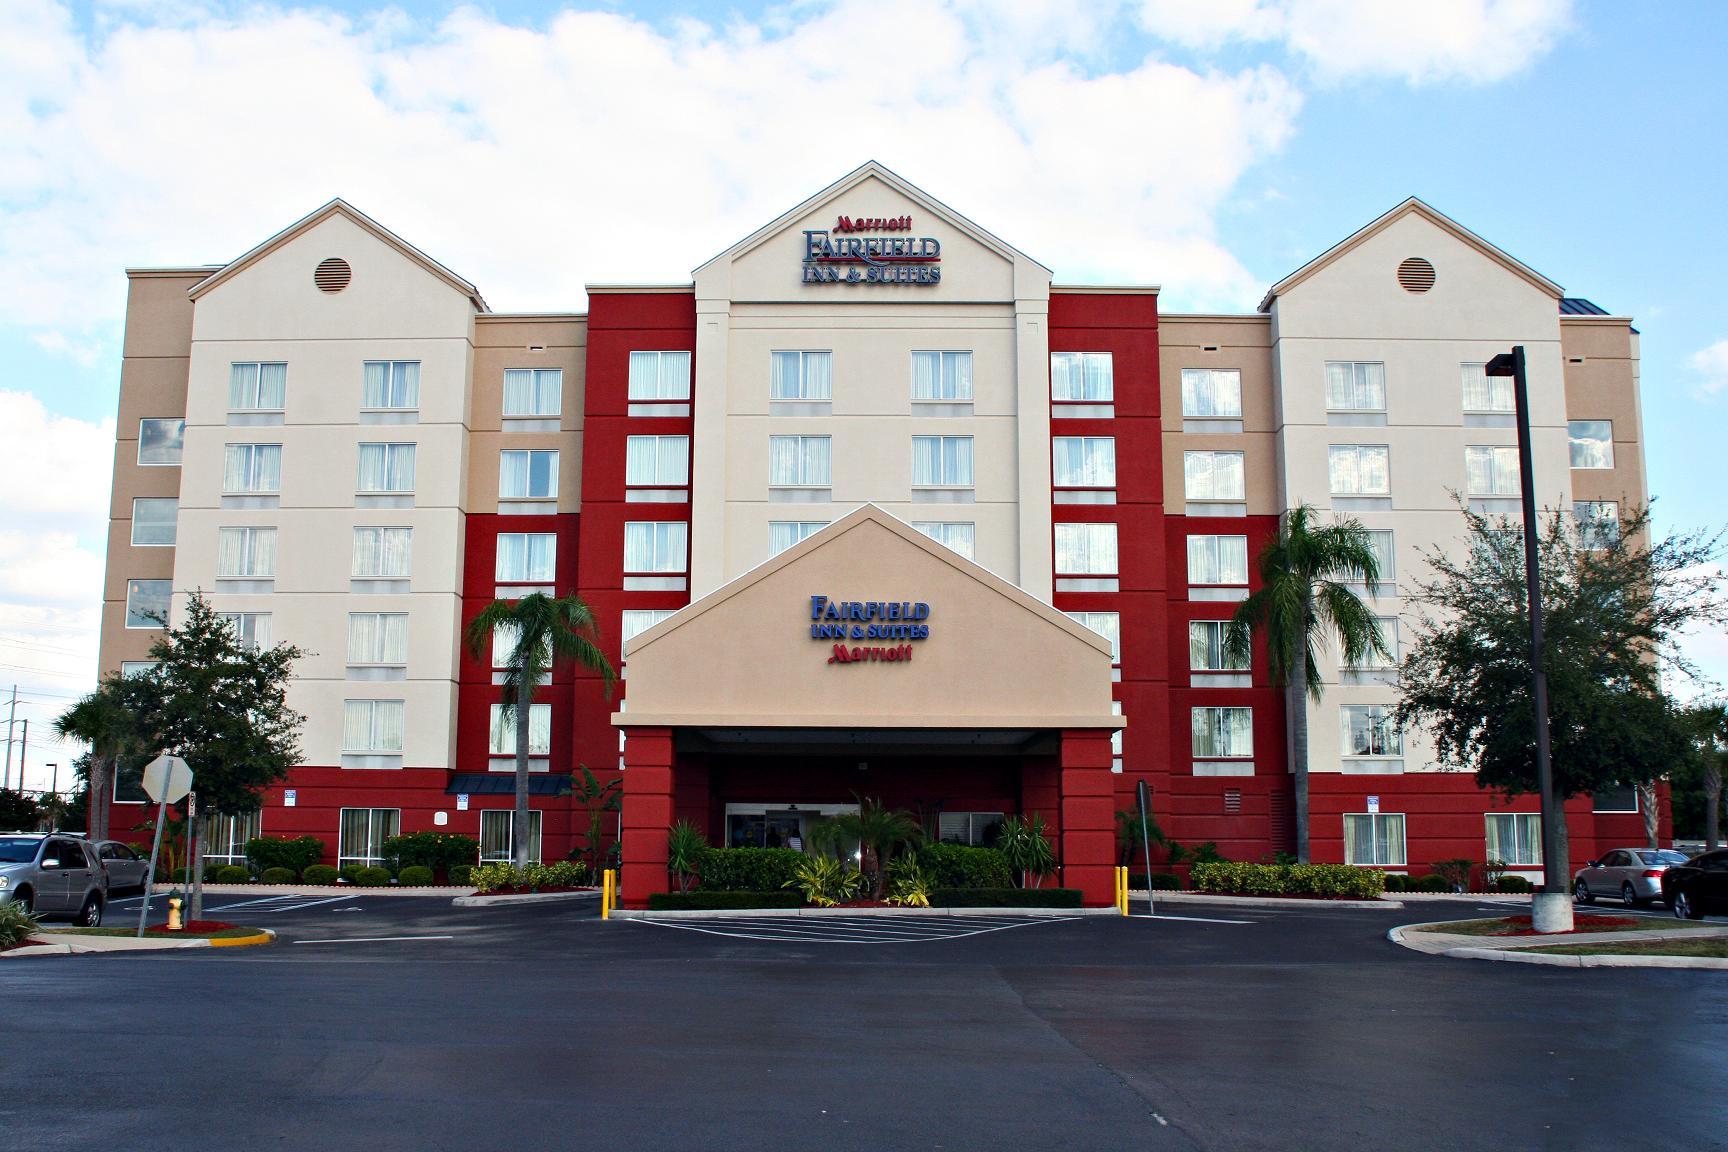 Fairfield Inn & Suites Orlando Universal Studios